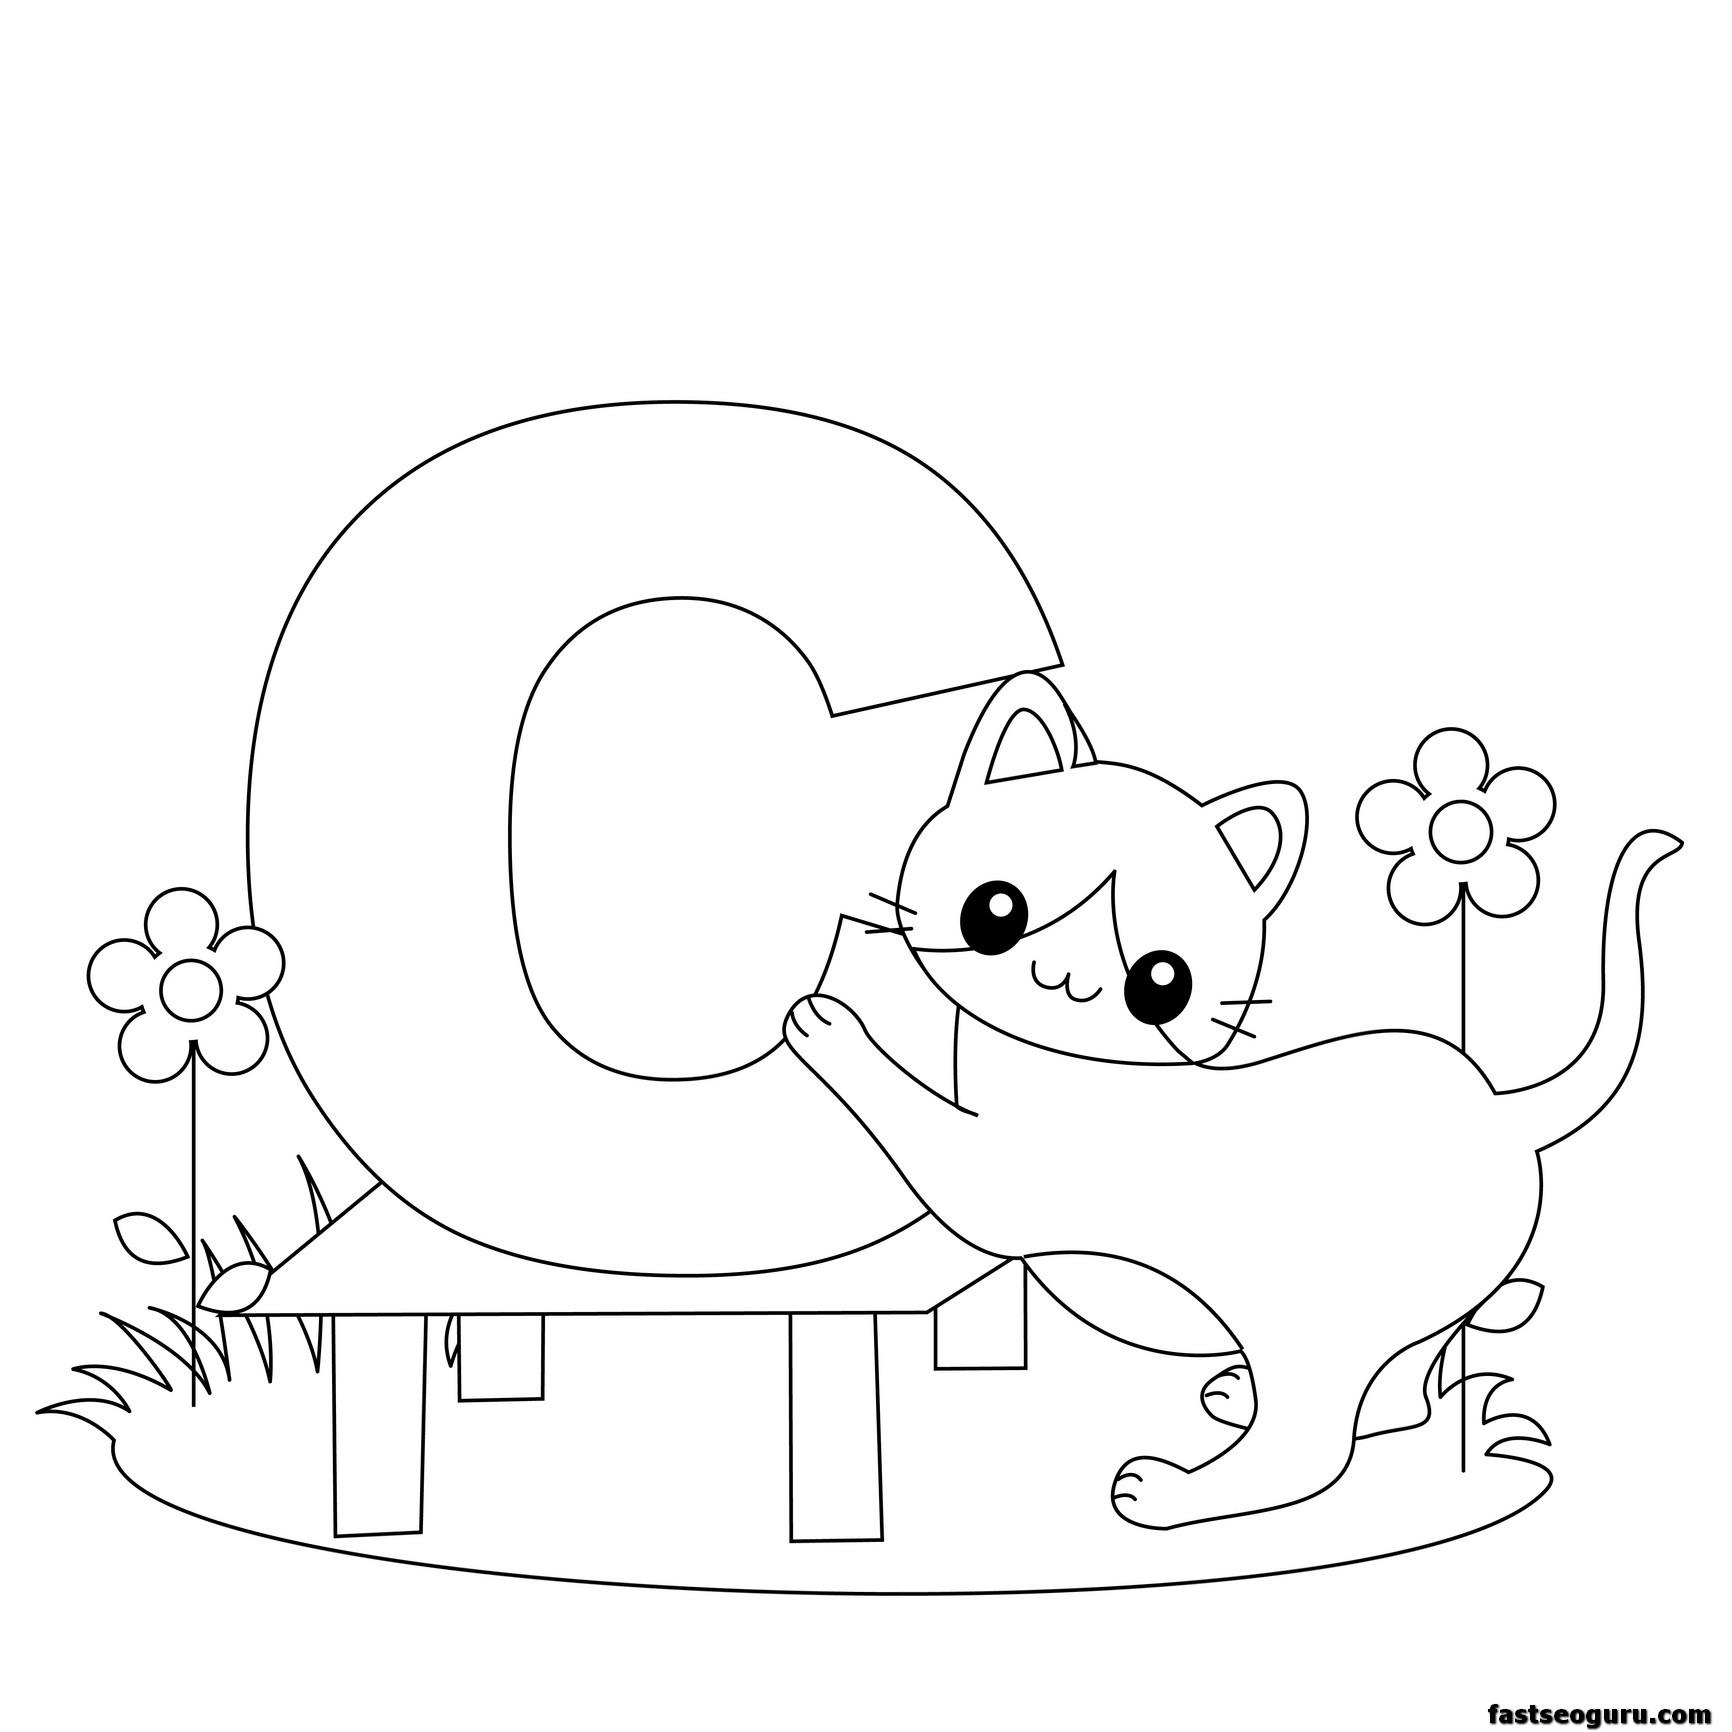 Printable Animal Alphabet Worksheets Letter C For Cat